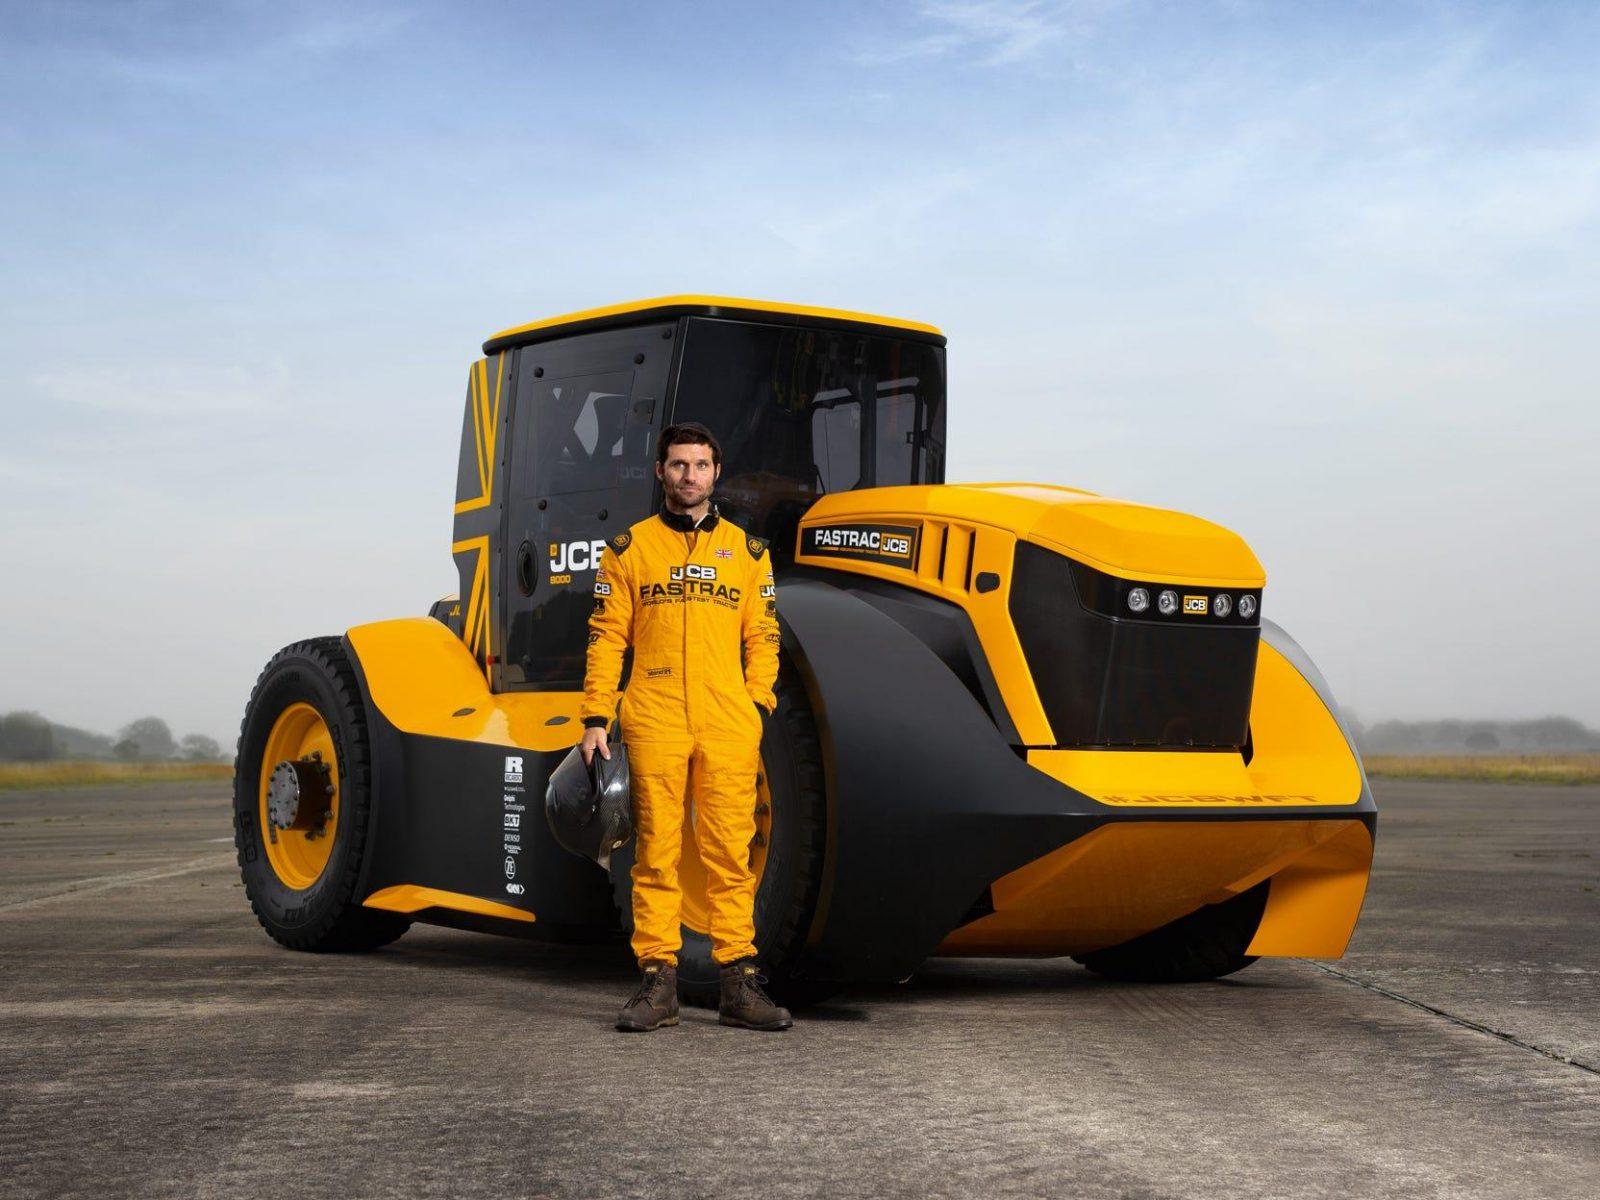 JCB Fastrac Two – самый быстрый в мире трактор